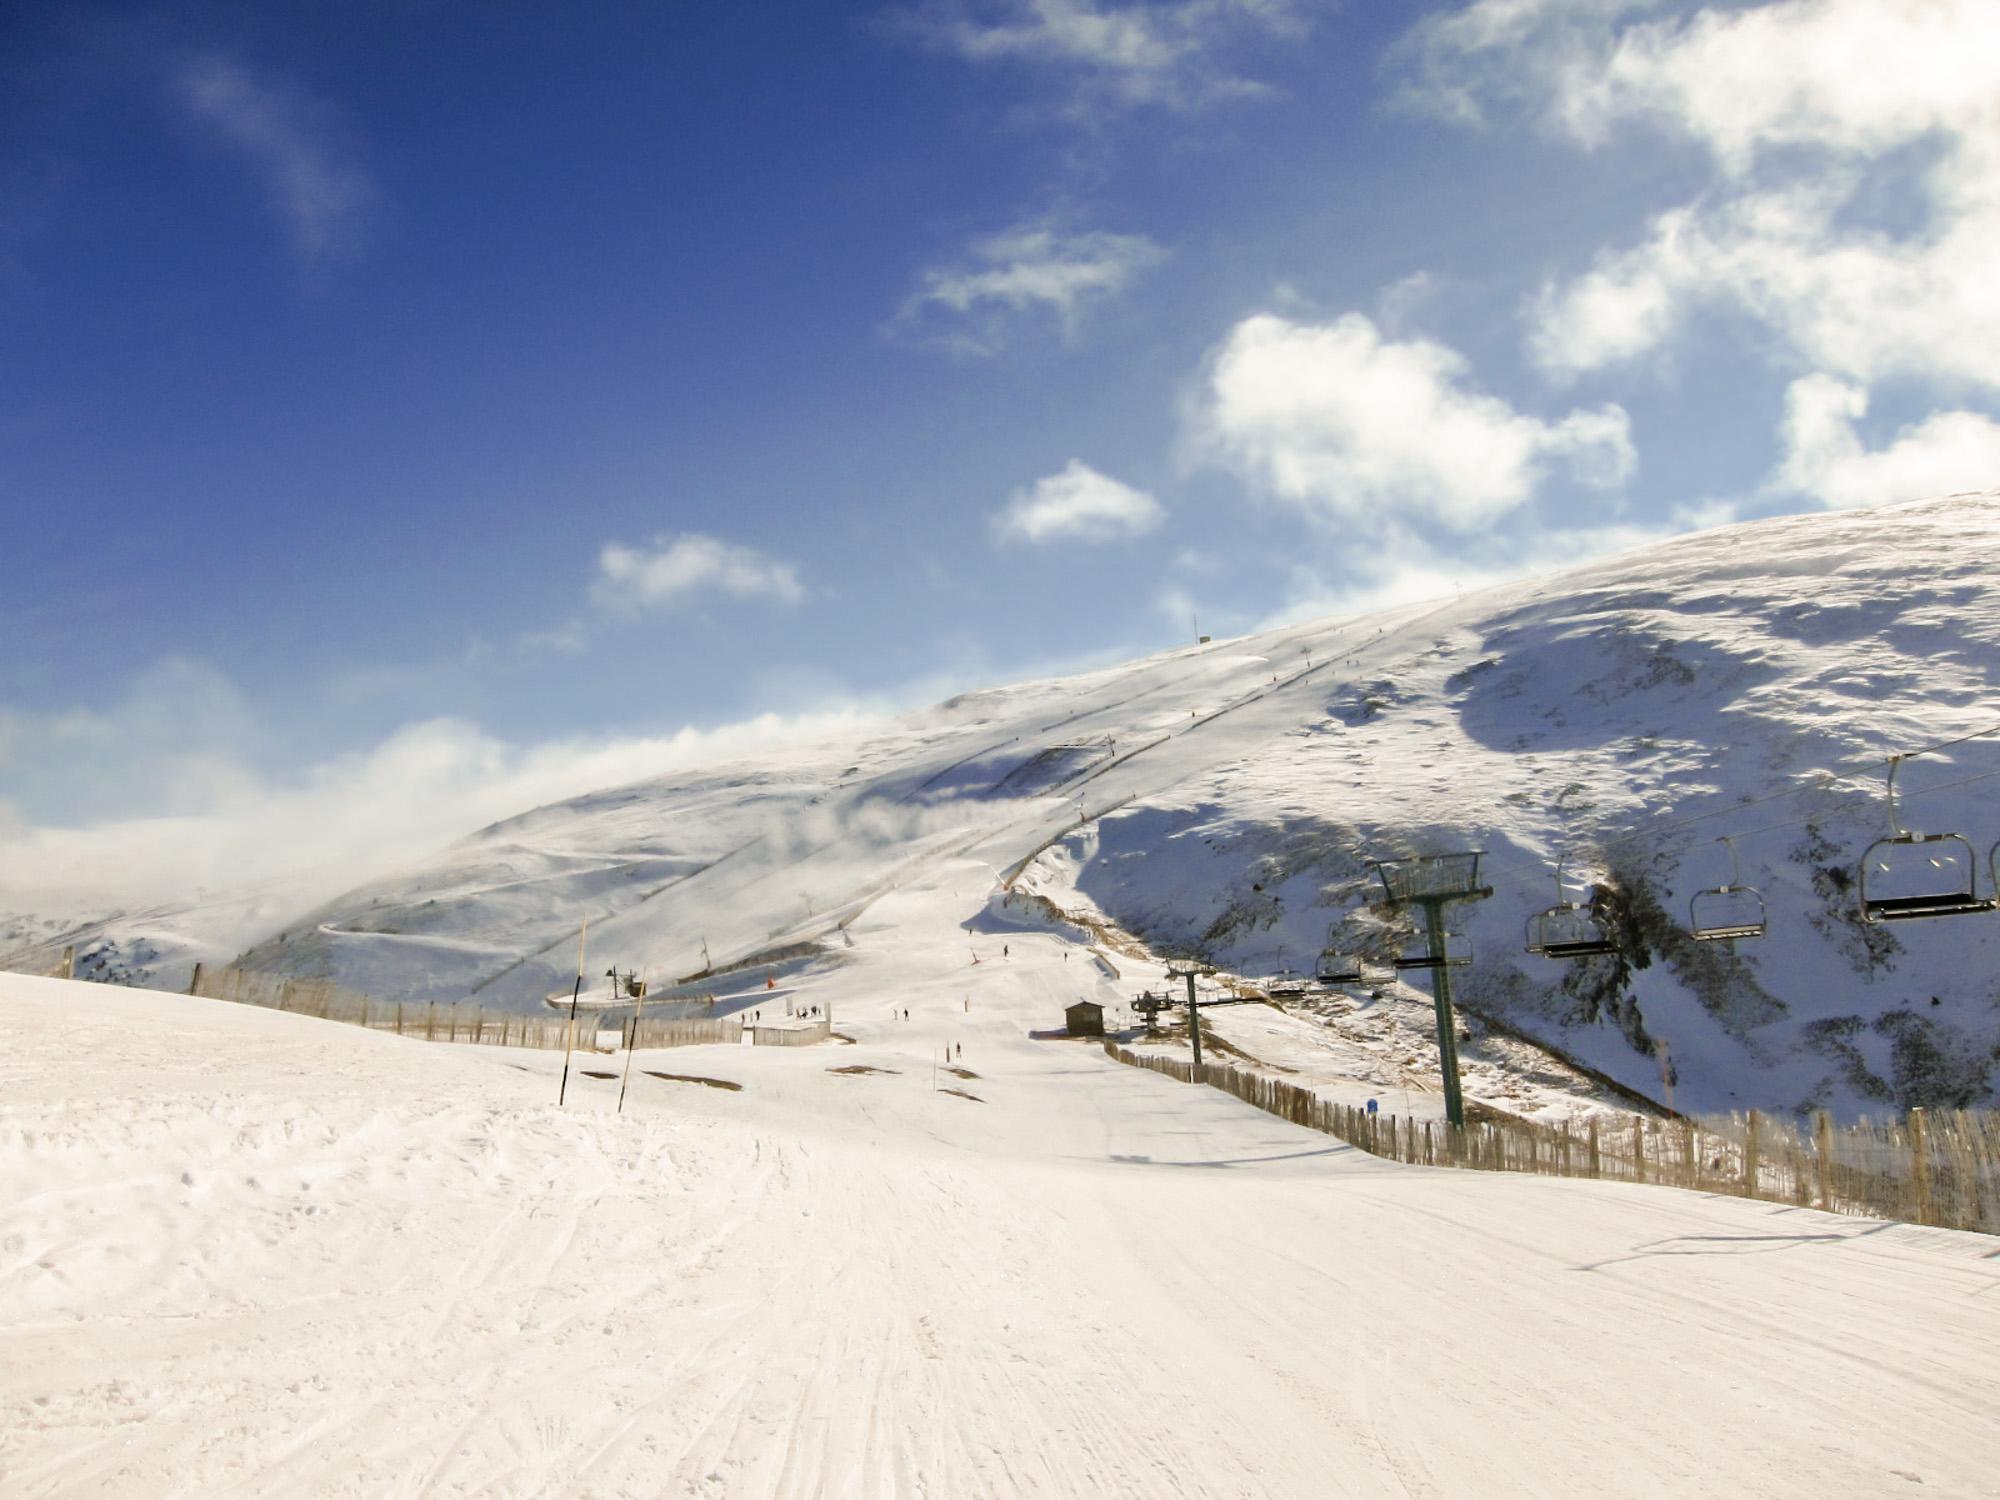 vamos-de-viaje-con-poc-grandvalira-andorra, persistencia o cambio, mar vidal, nieve, deporte, esqui, sky, snow, andorra, europa